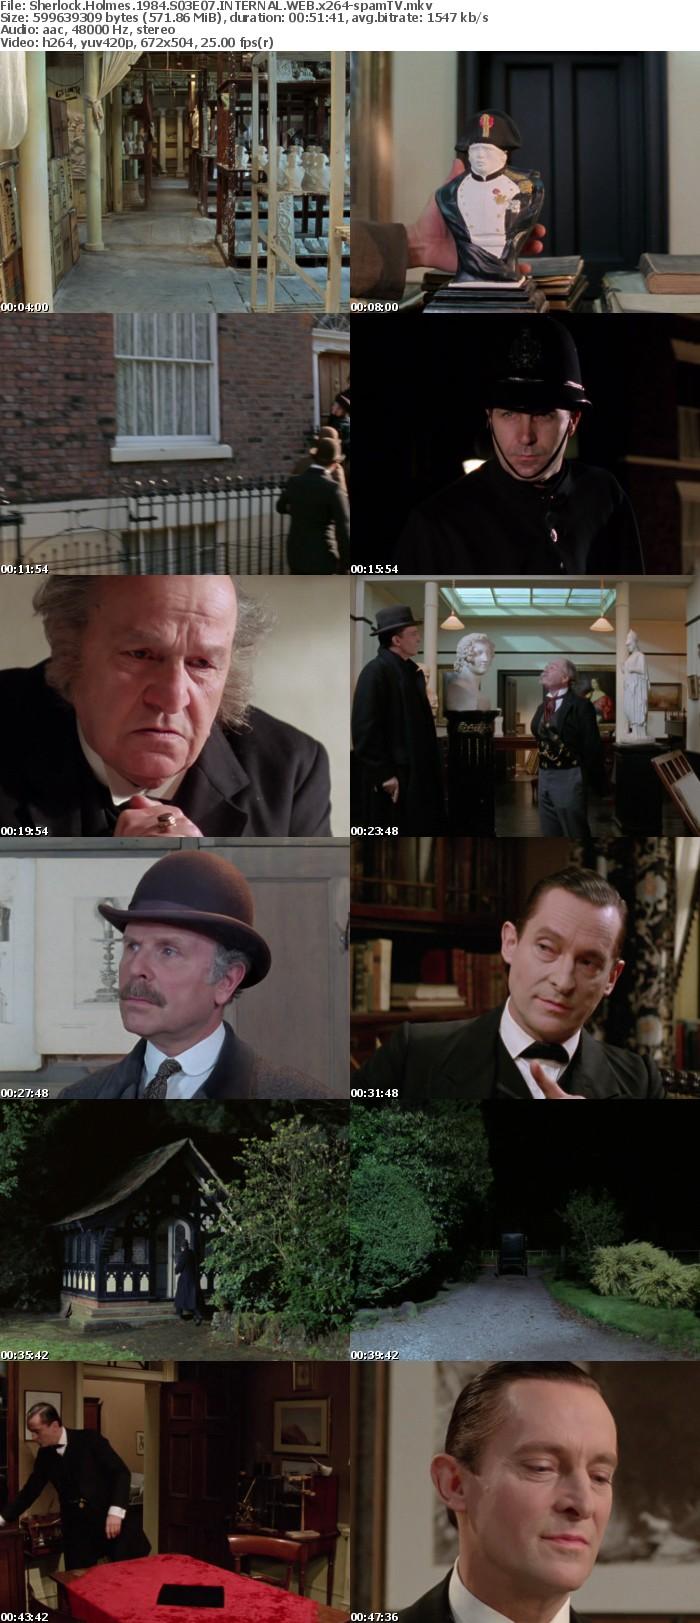 Sherlock Holmes 1984 S03E07 INTERNAL WEB x264-spamTV